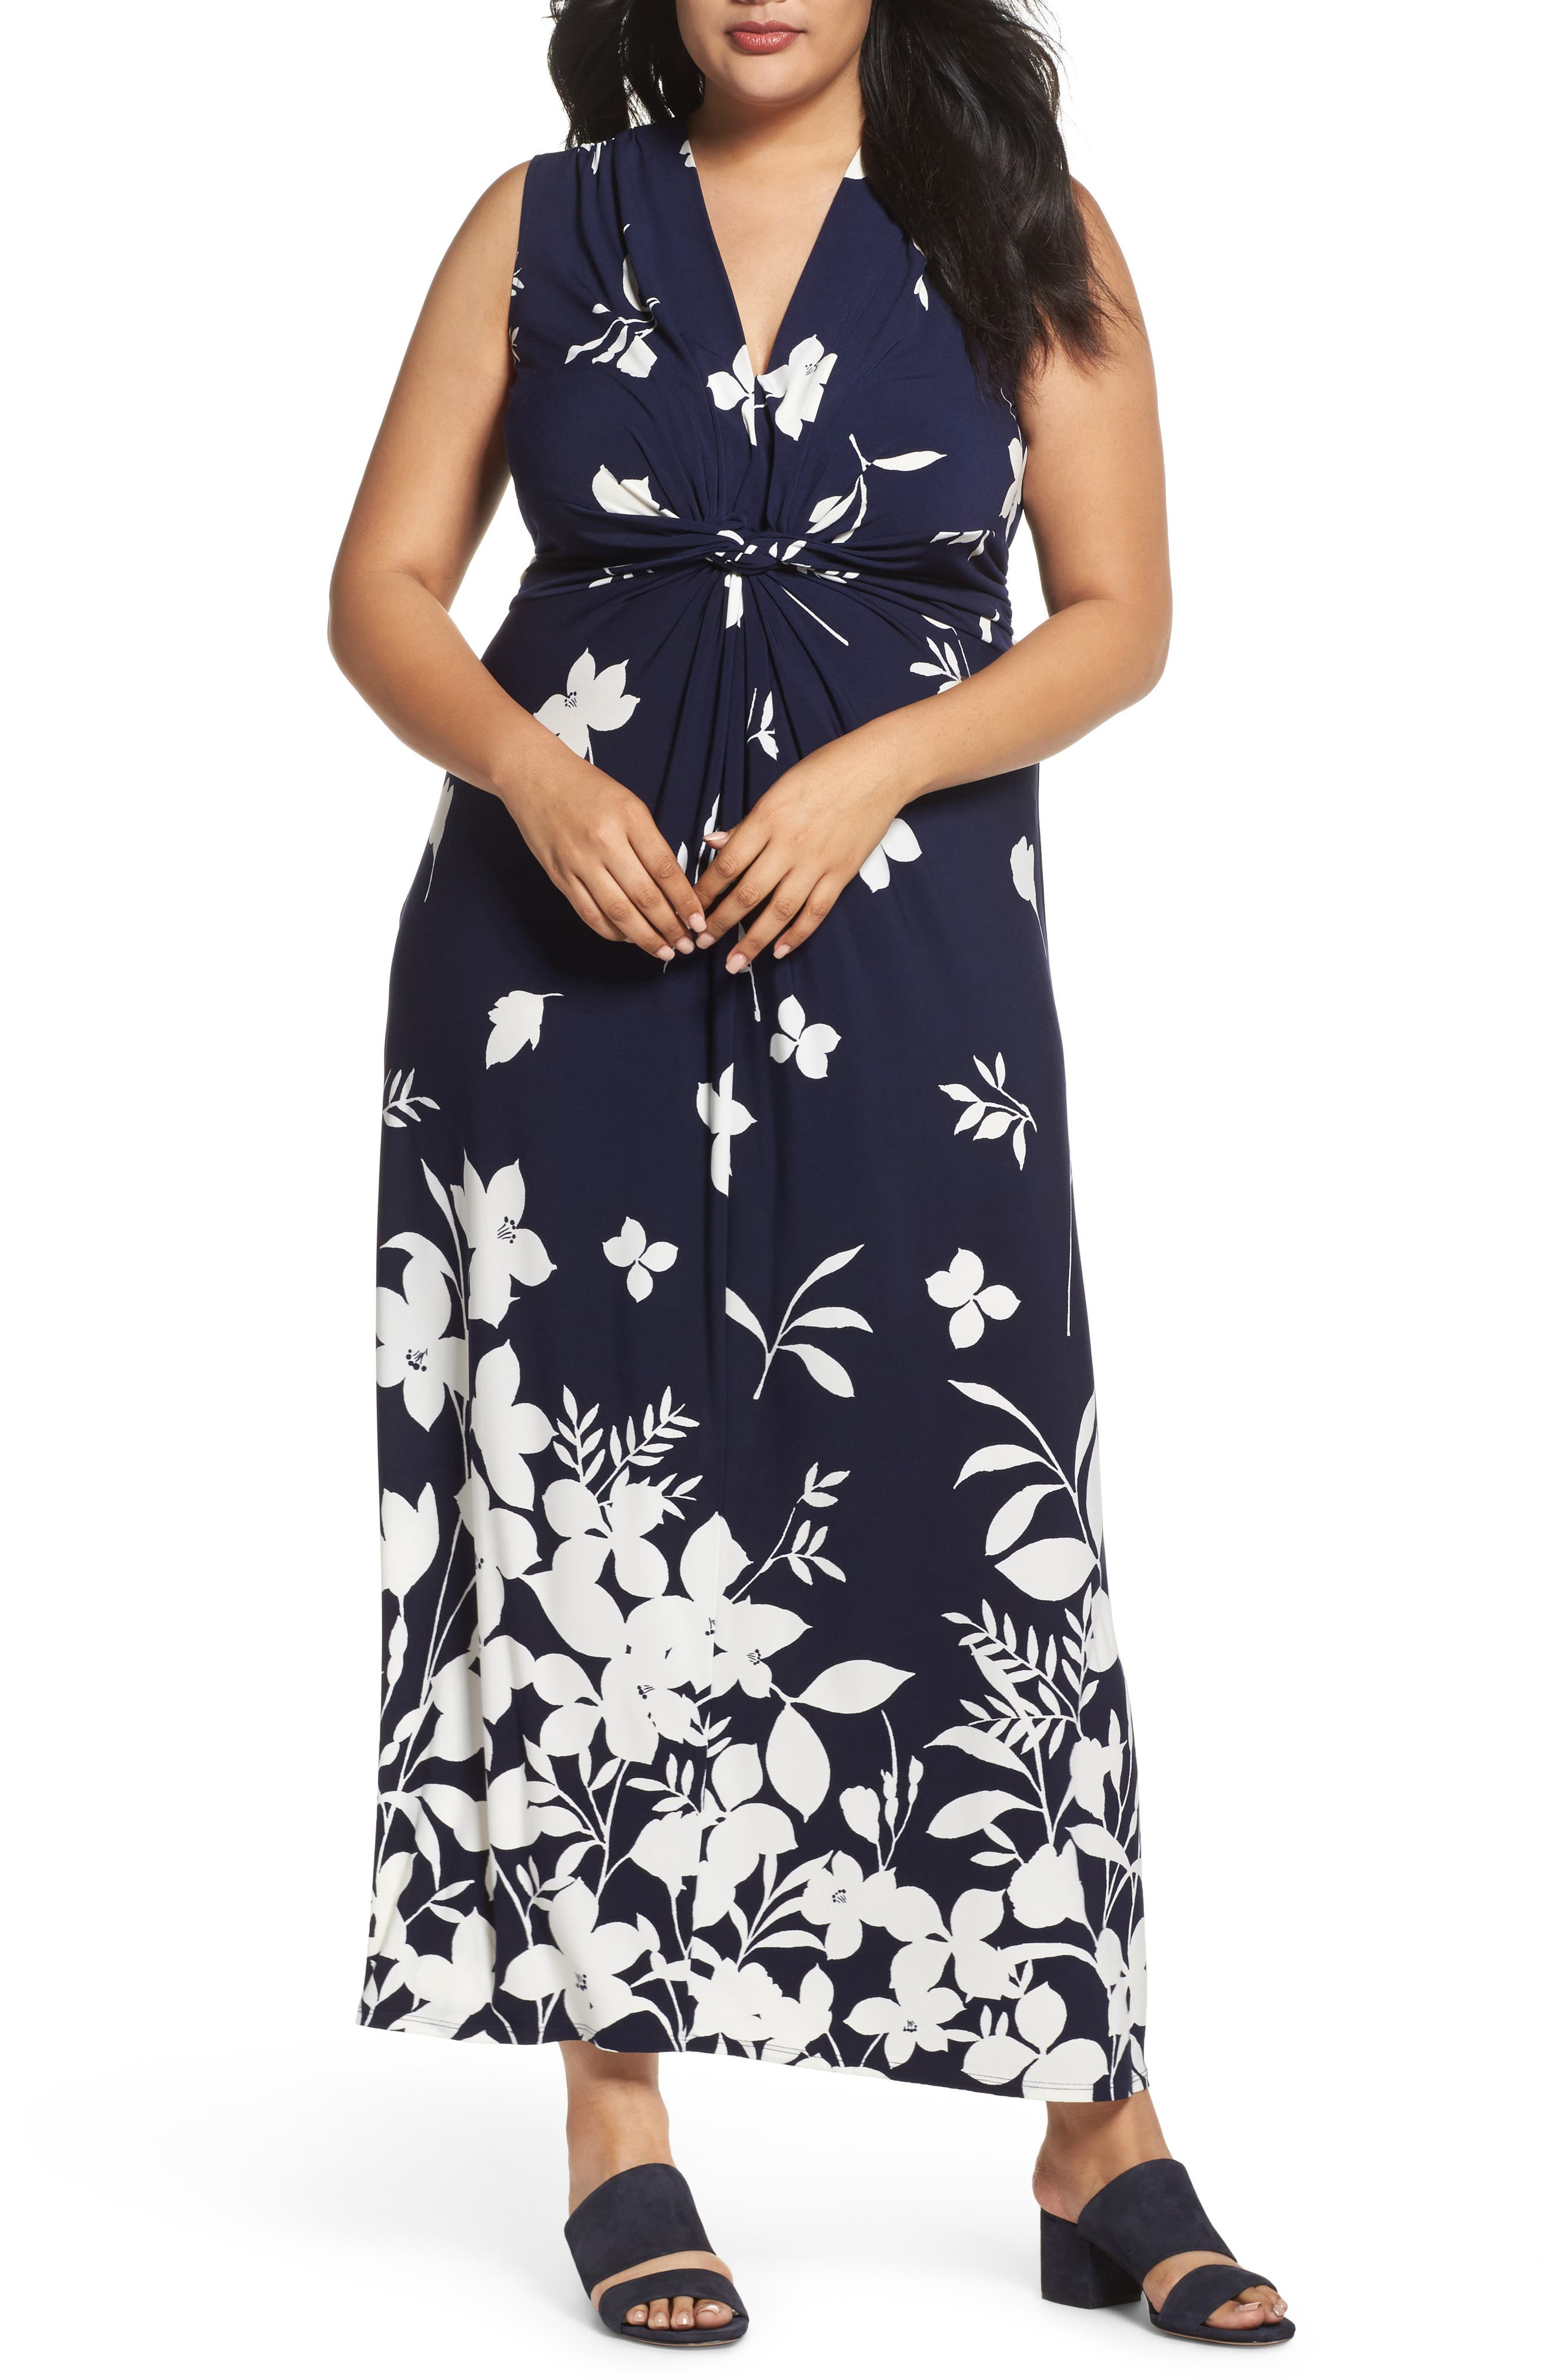 Alternate Image 1 Selected - Eliza J Sleeveless Knot Detail Maxi Dress (Plus Size)